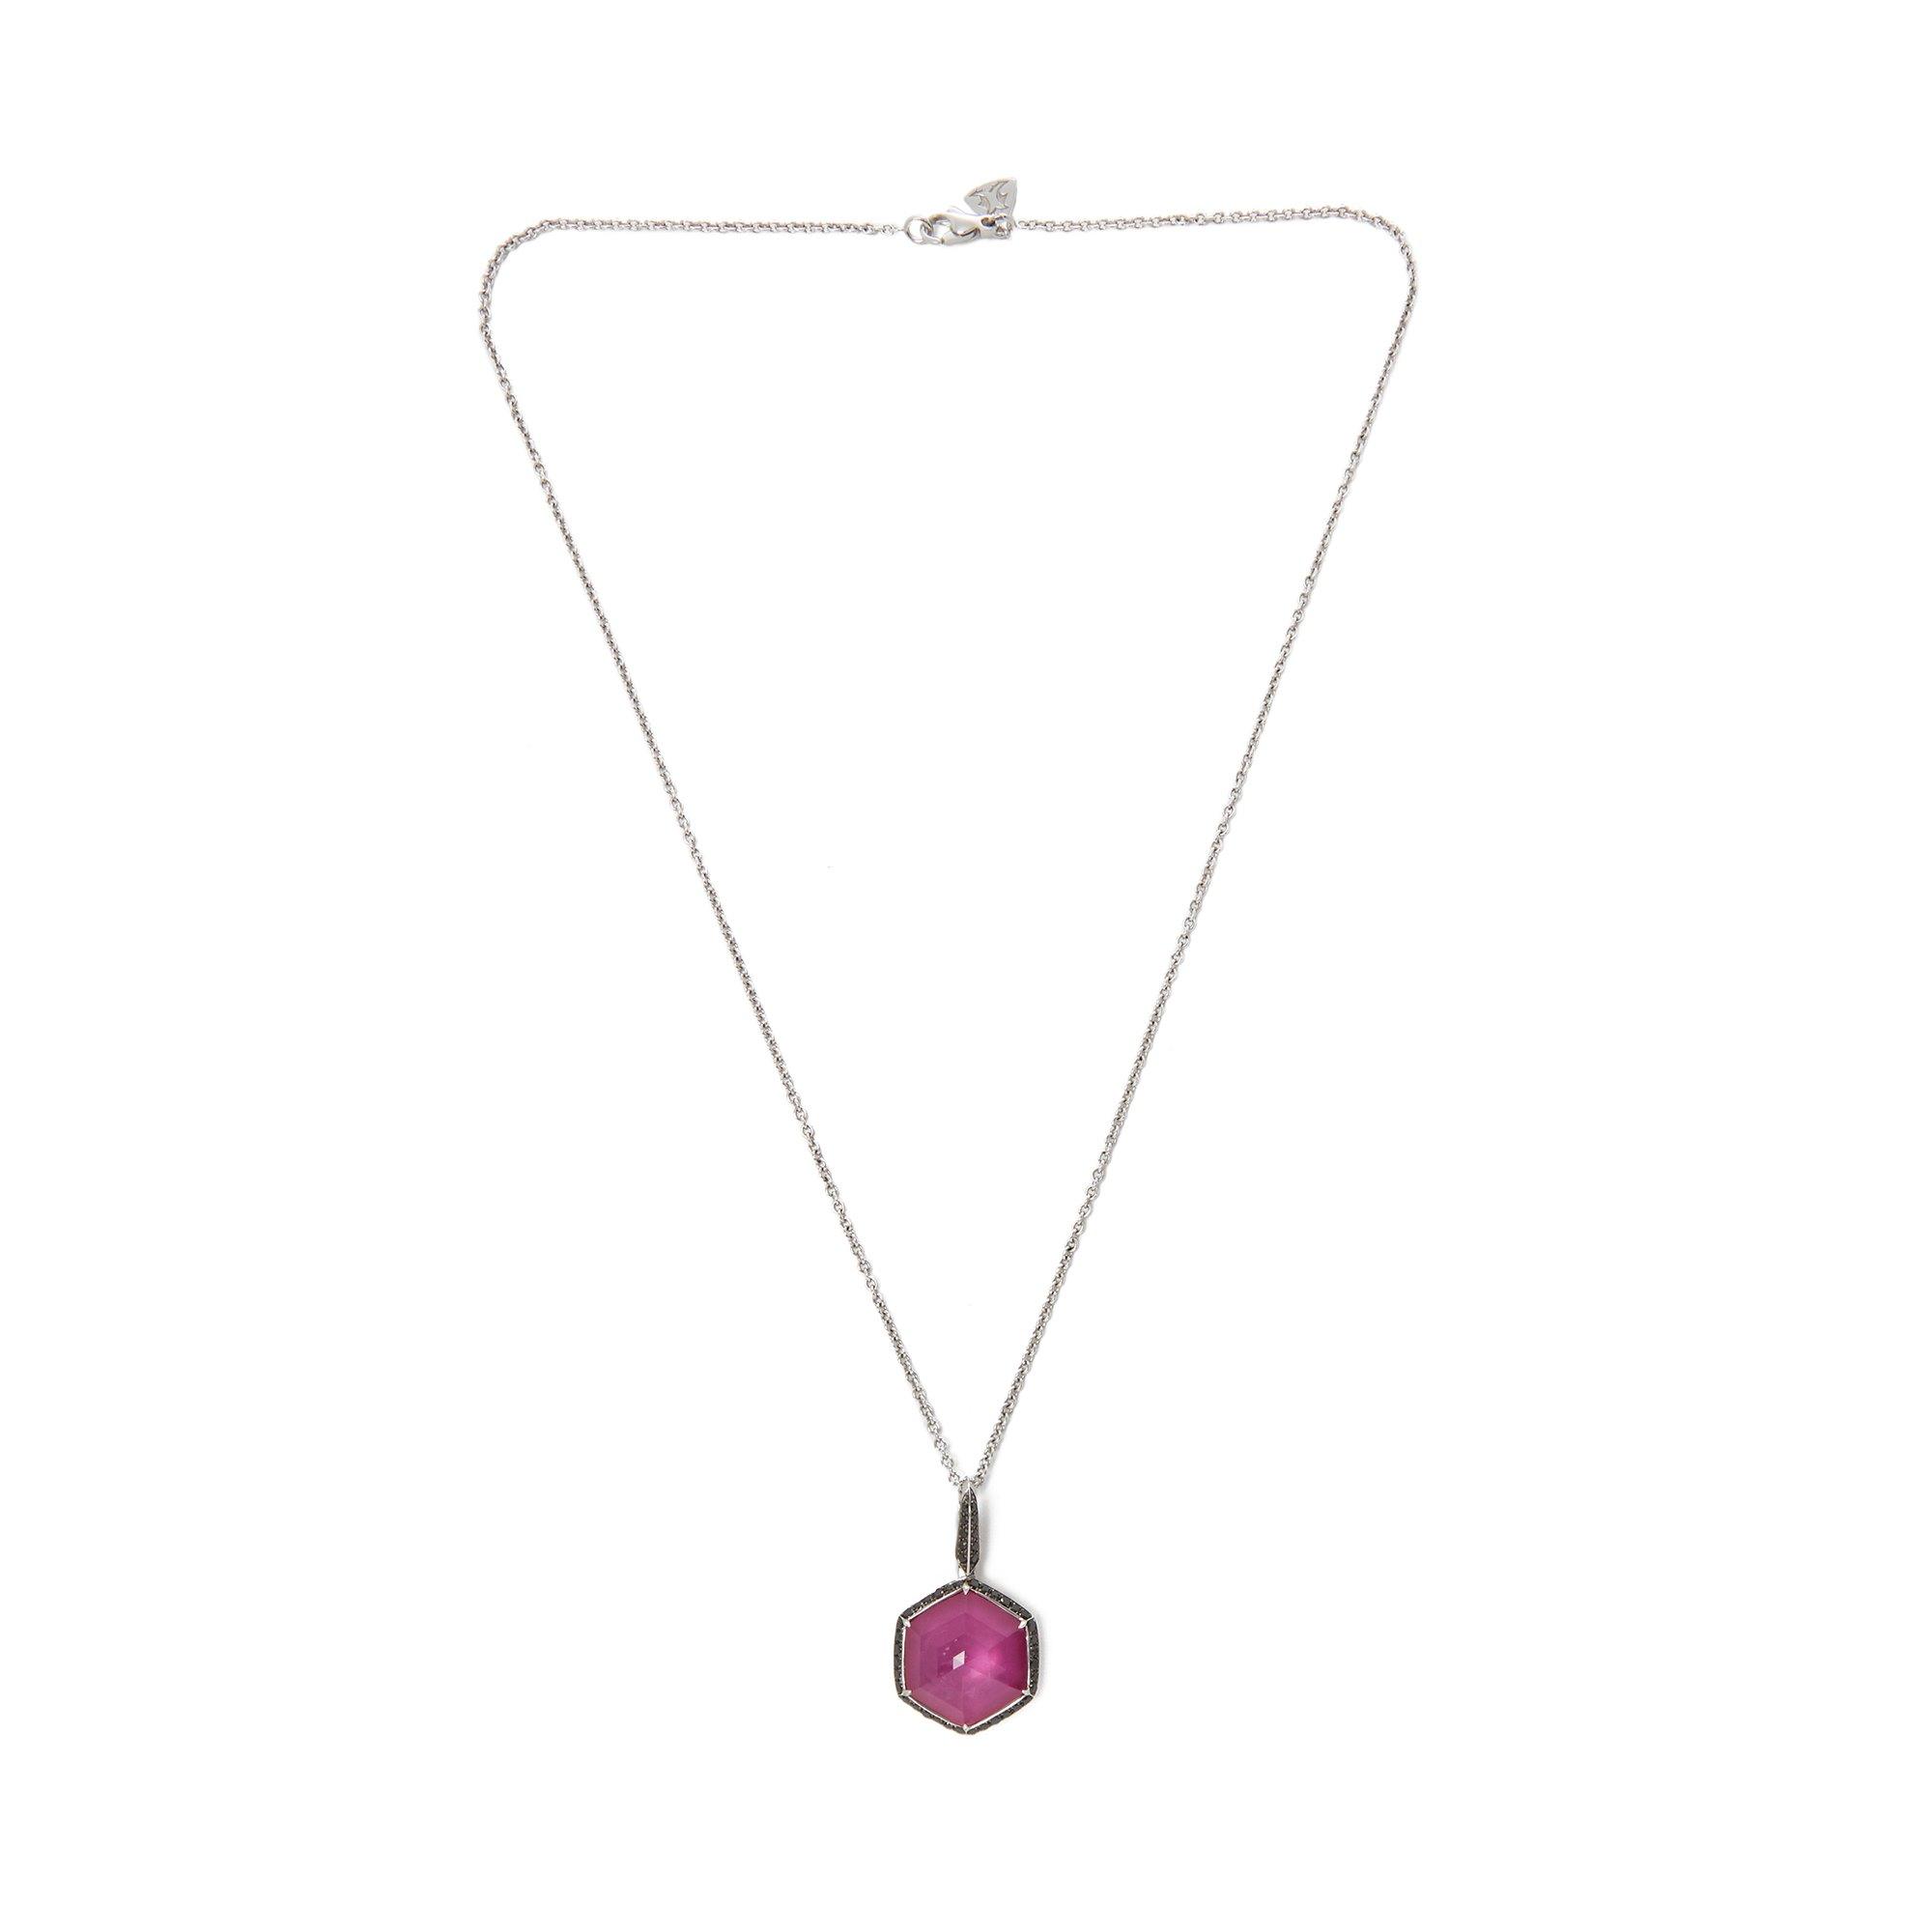 Stephen Webster Deco Haze 18ct White Gold Ruby Quartz and Black Diamond Pendant